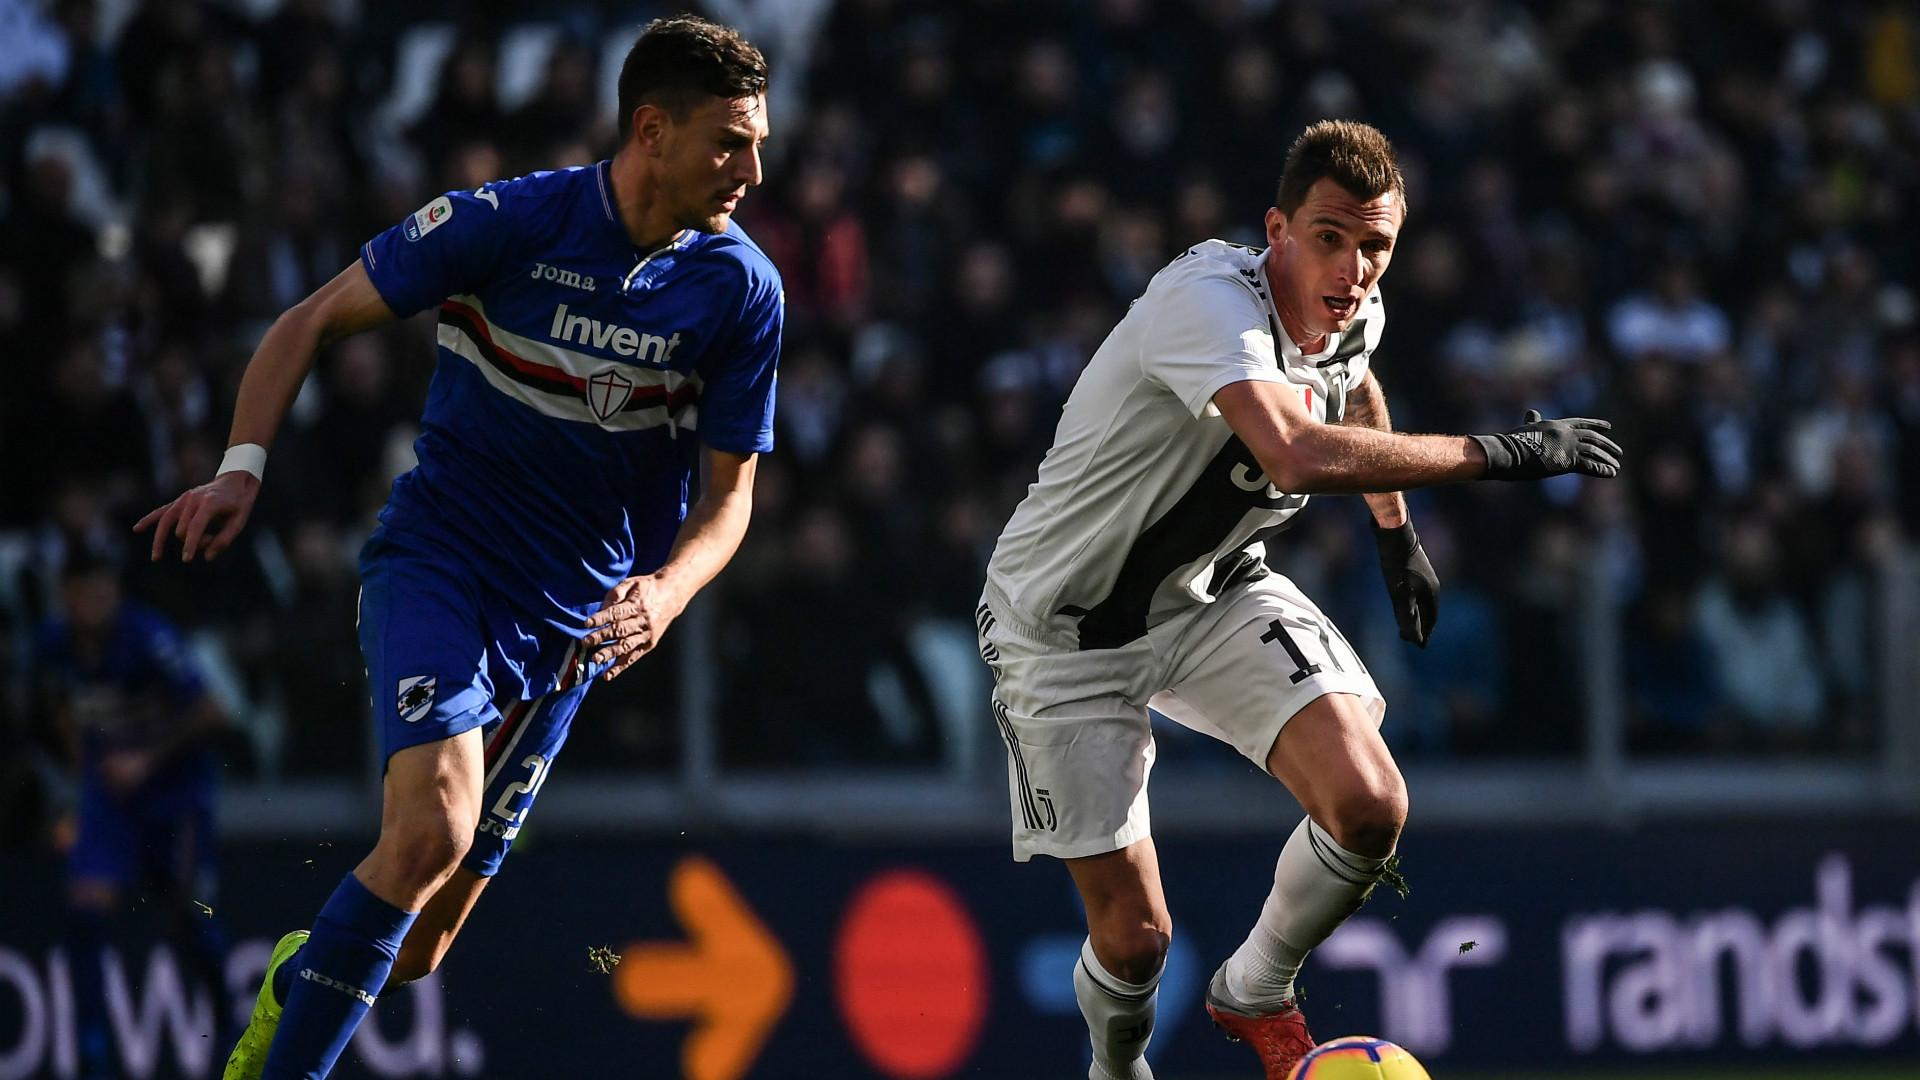 Genoa vs sampdoria betting preview goal sp in betting